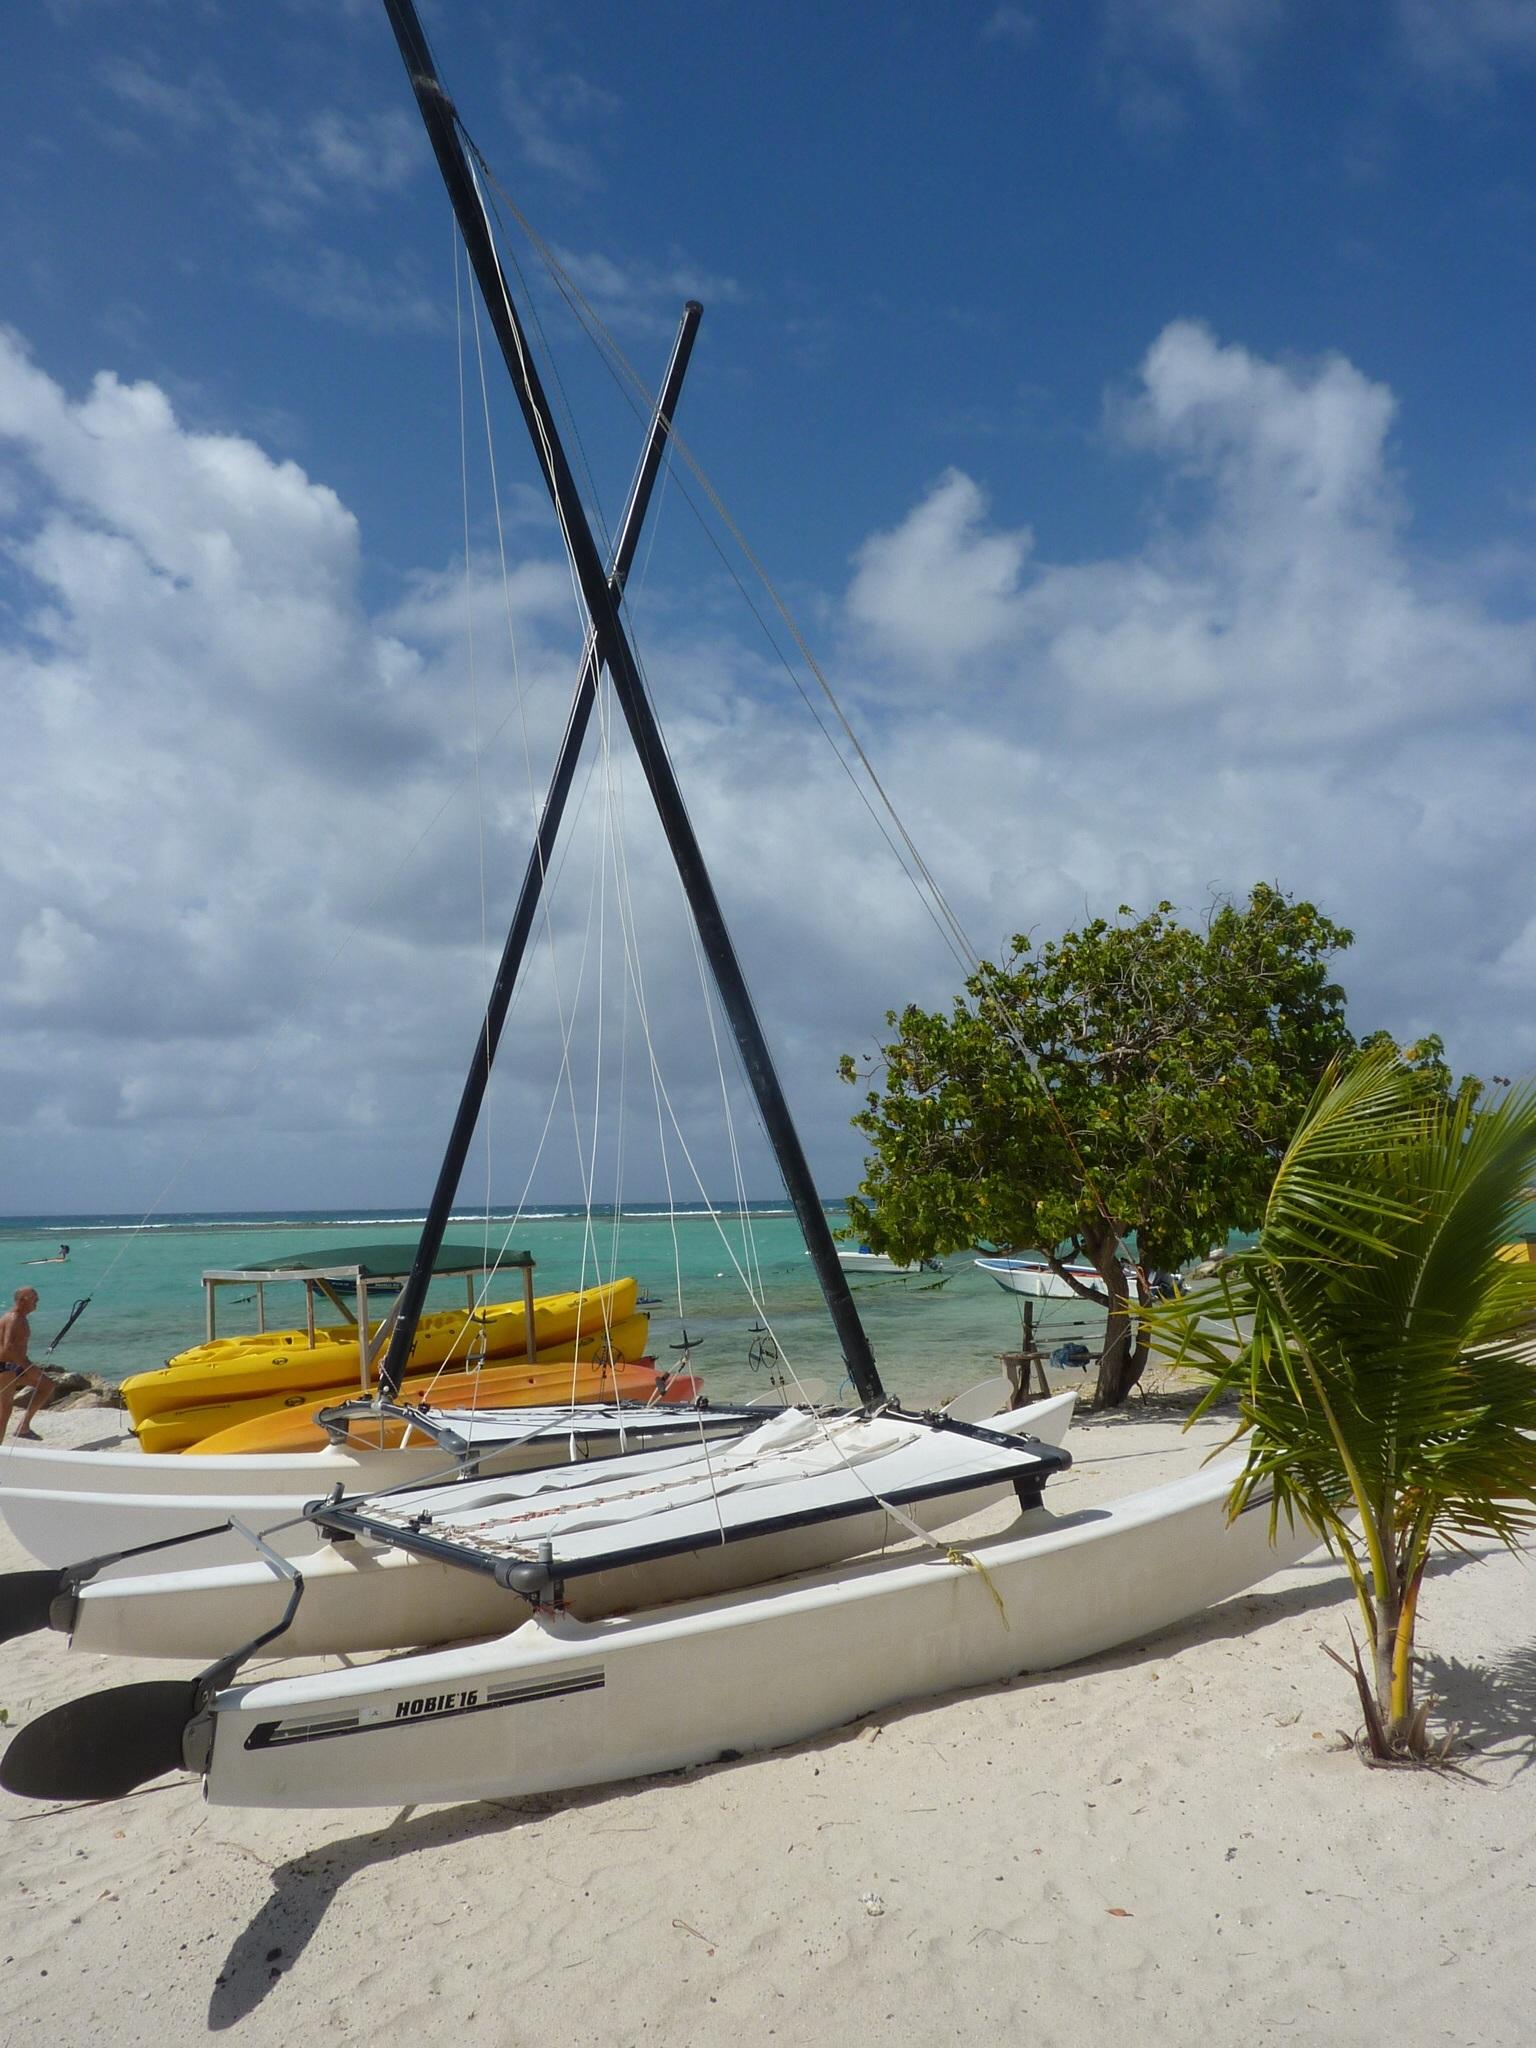 Guadeloupe både